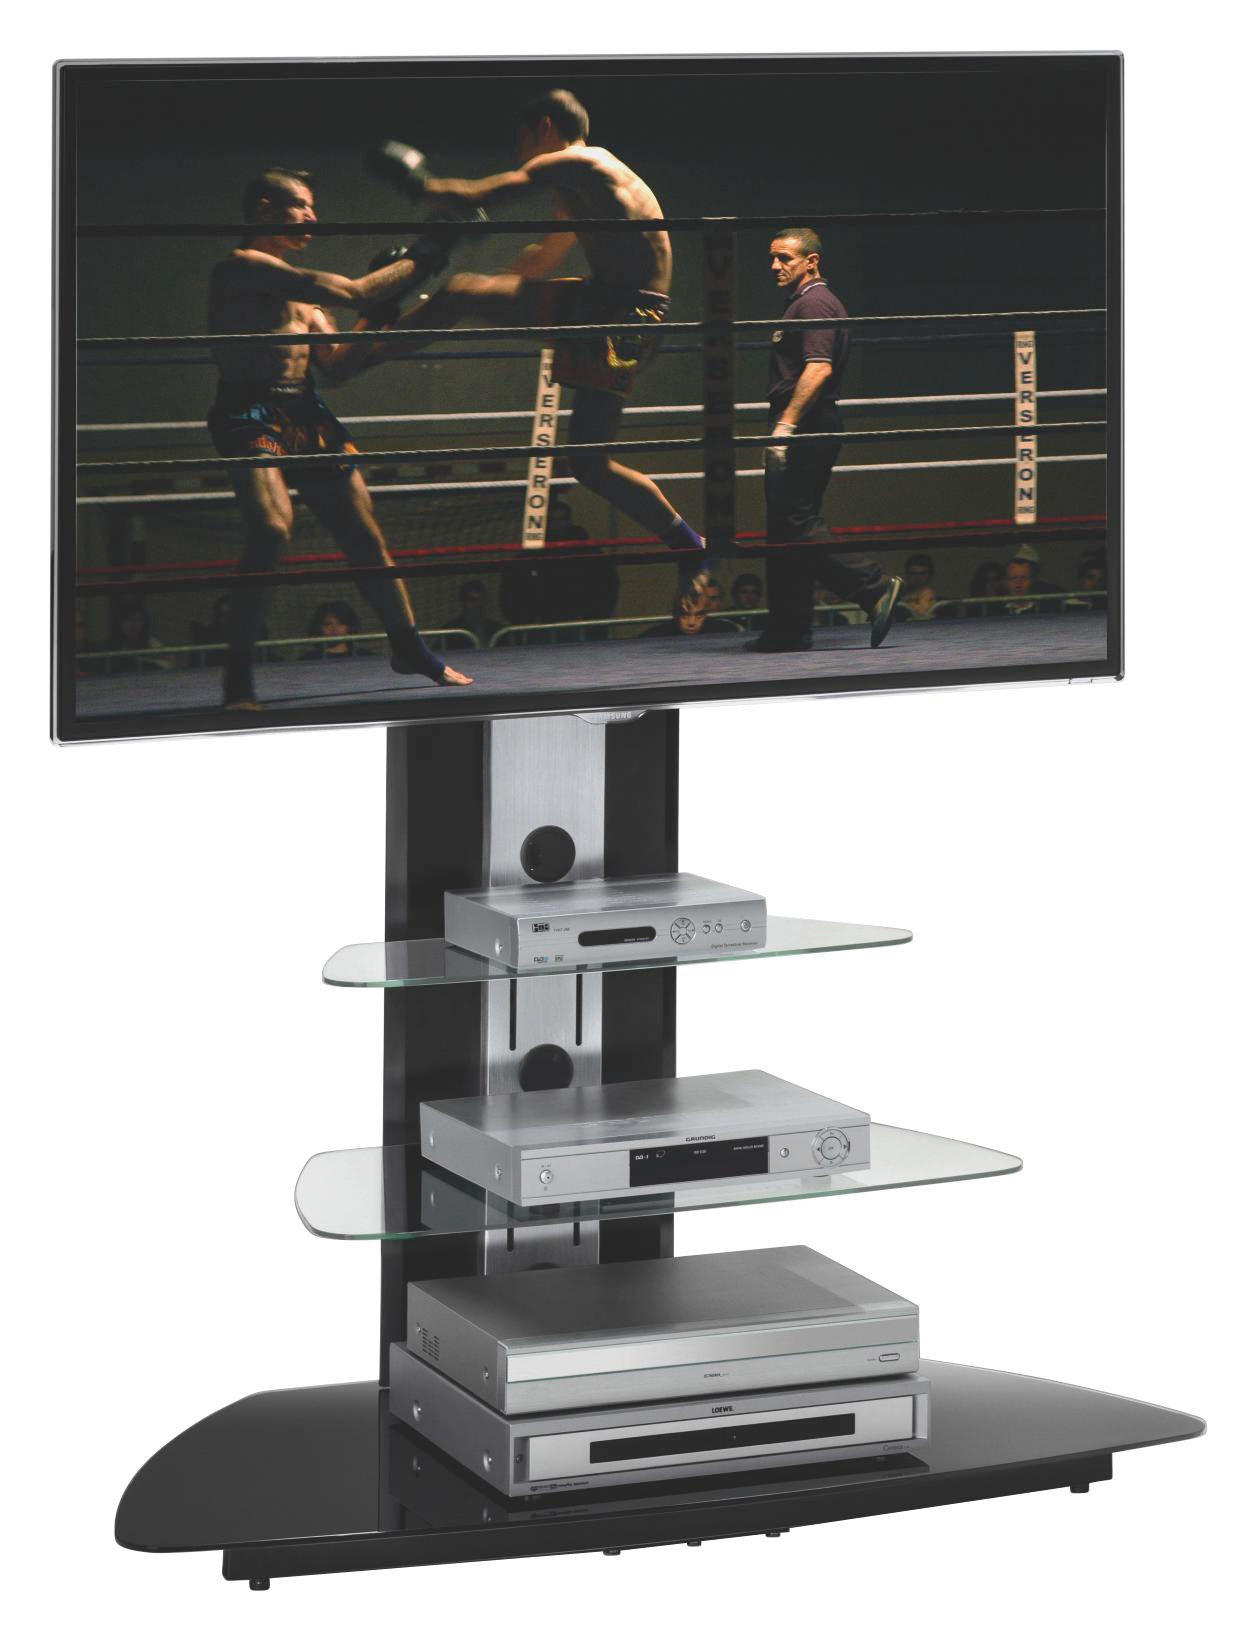 TV-RACK Glas, Metall Alufarben, Schwarz - Alufarben/Schwarz, Design, Glas/Metall (110/128/53cm)